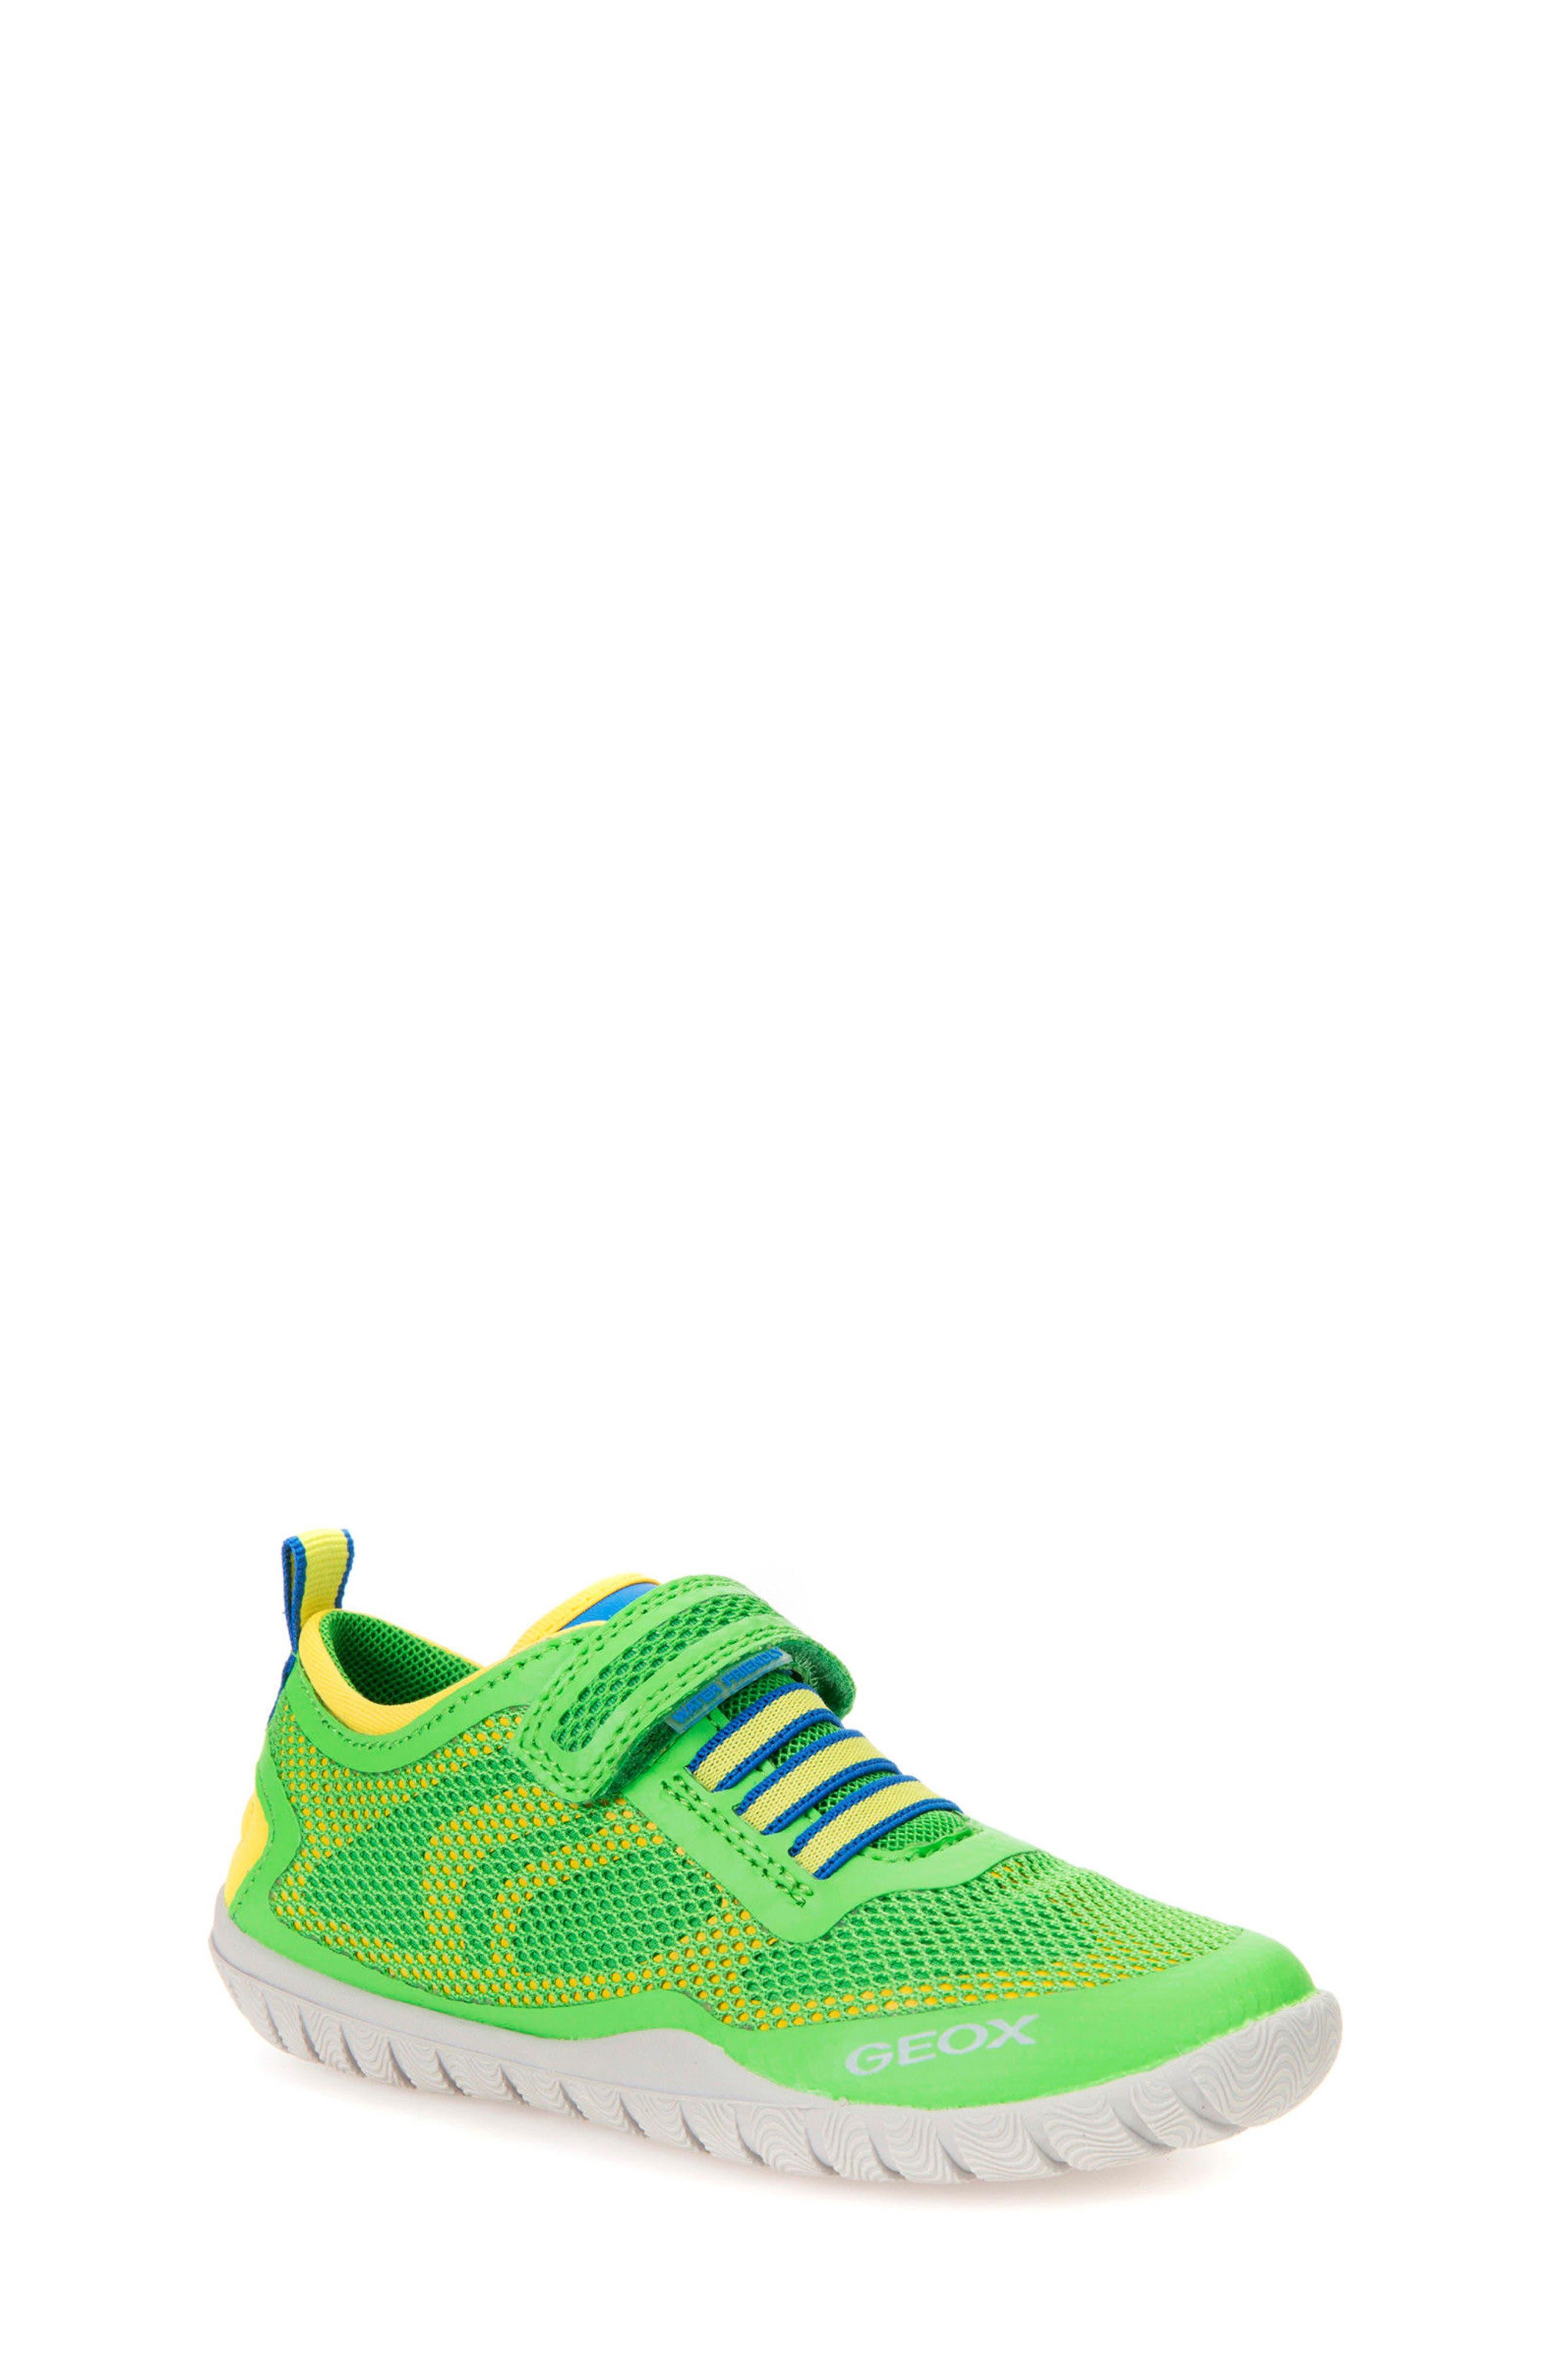 Trifon Sneaker,                         Main,                         color, GREEN/ YELLOW